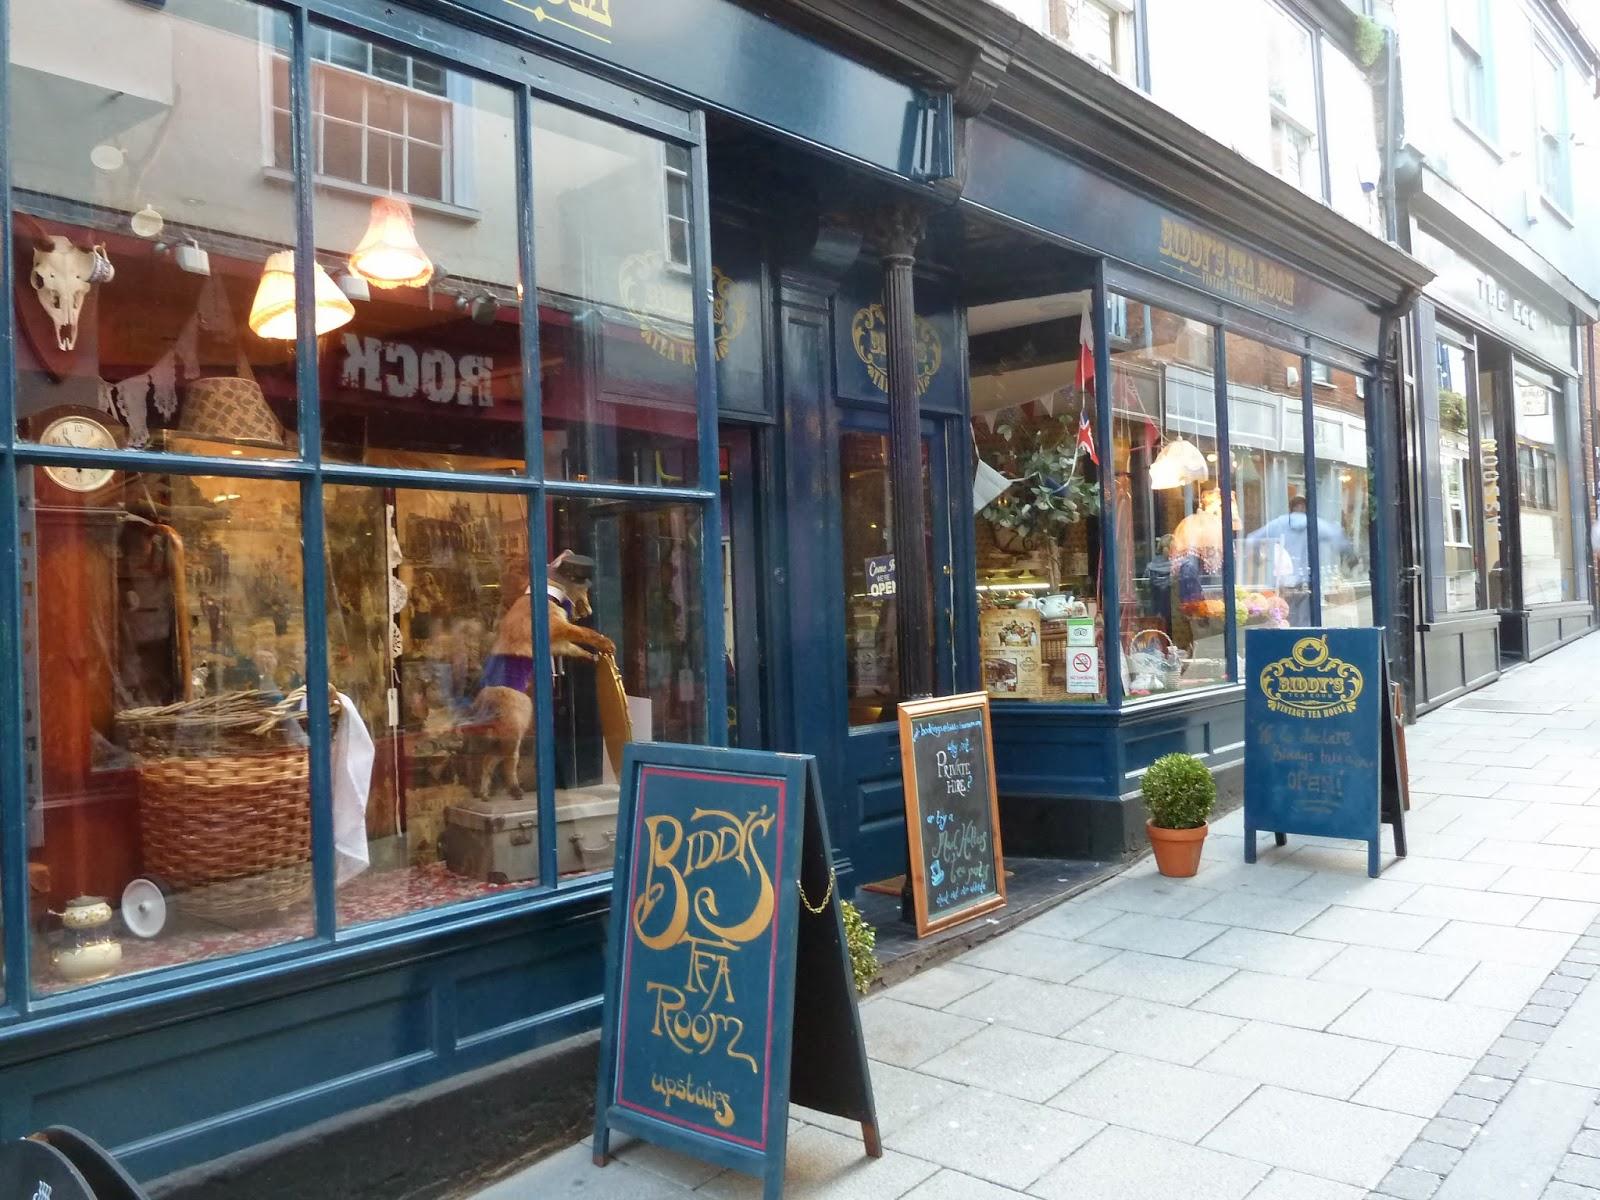 A Gastrono Geeks Guide Biddy S Tea Room Norwich